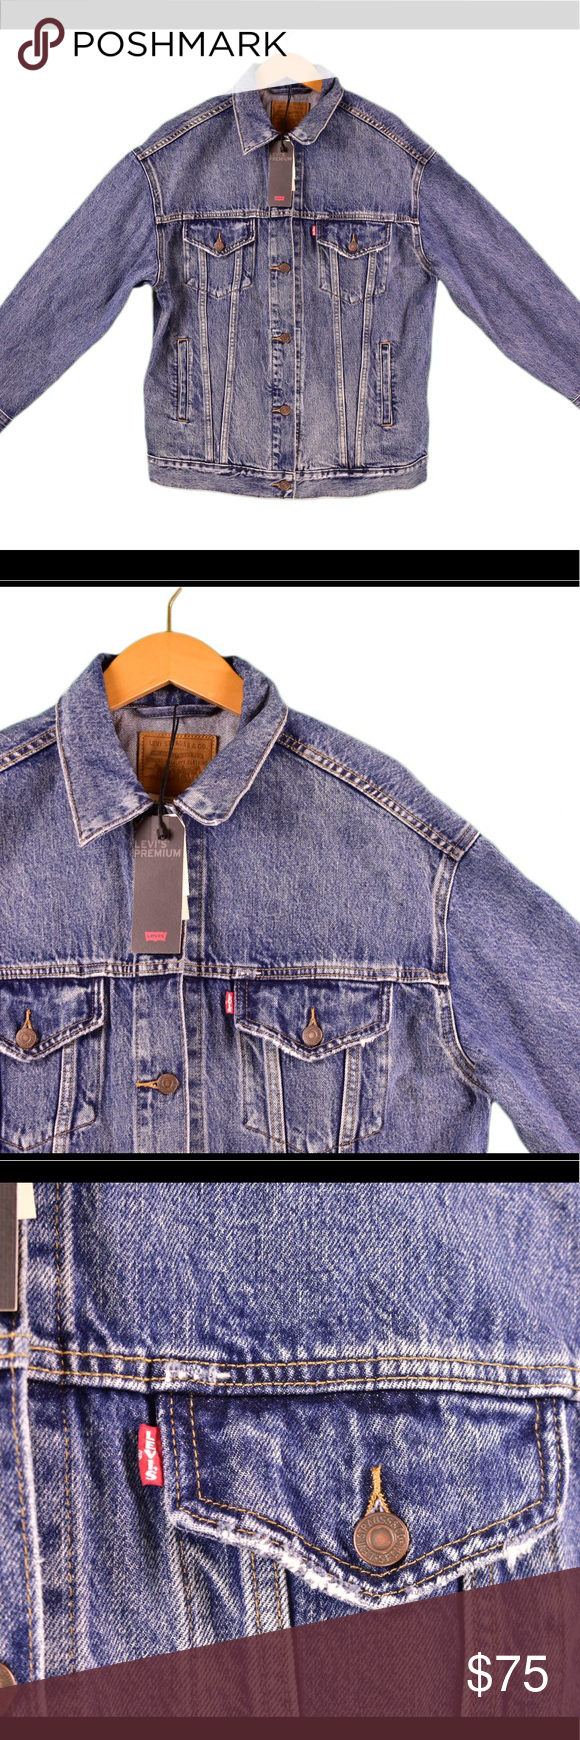 Men's Levi denim jacket Men's Levi denim trucker style ...